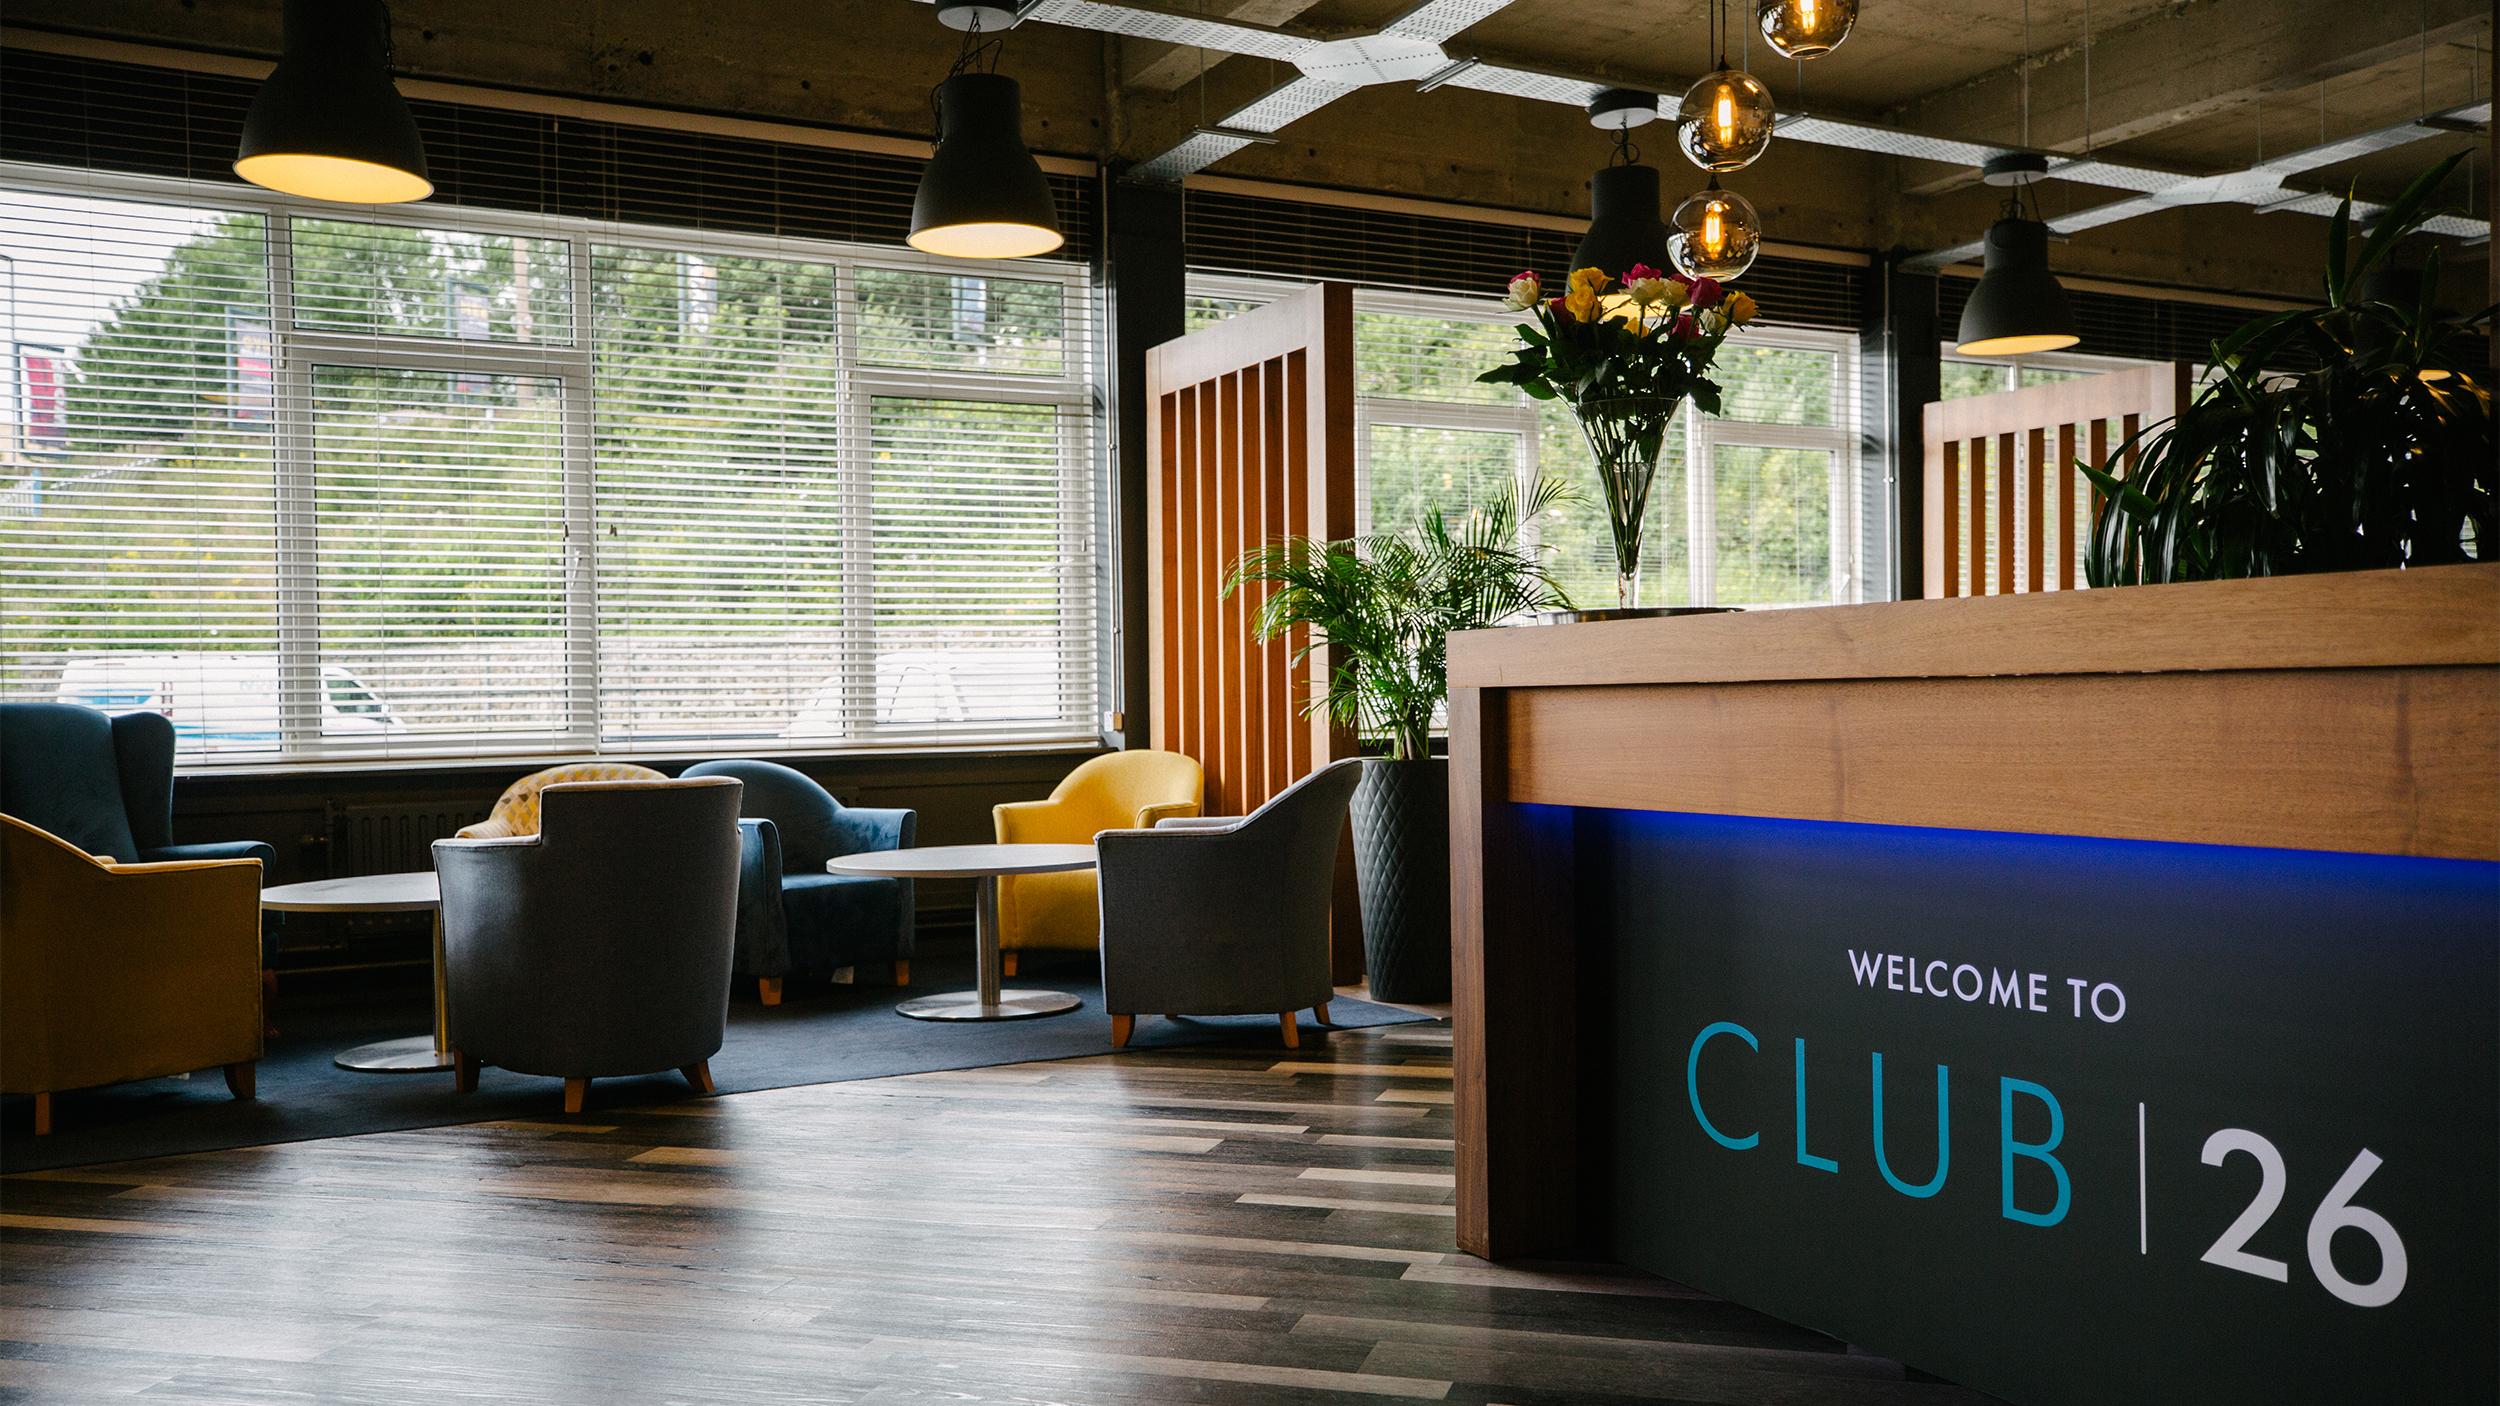 hub26 meet - club26 co-working